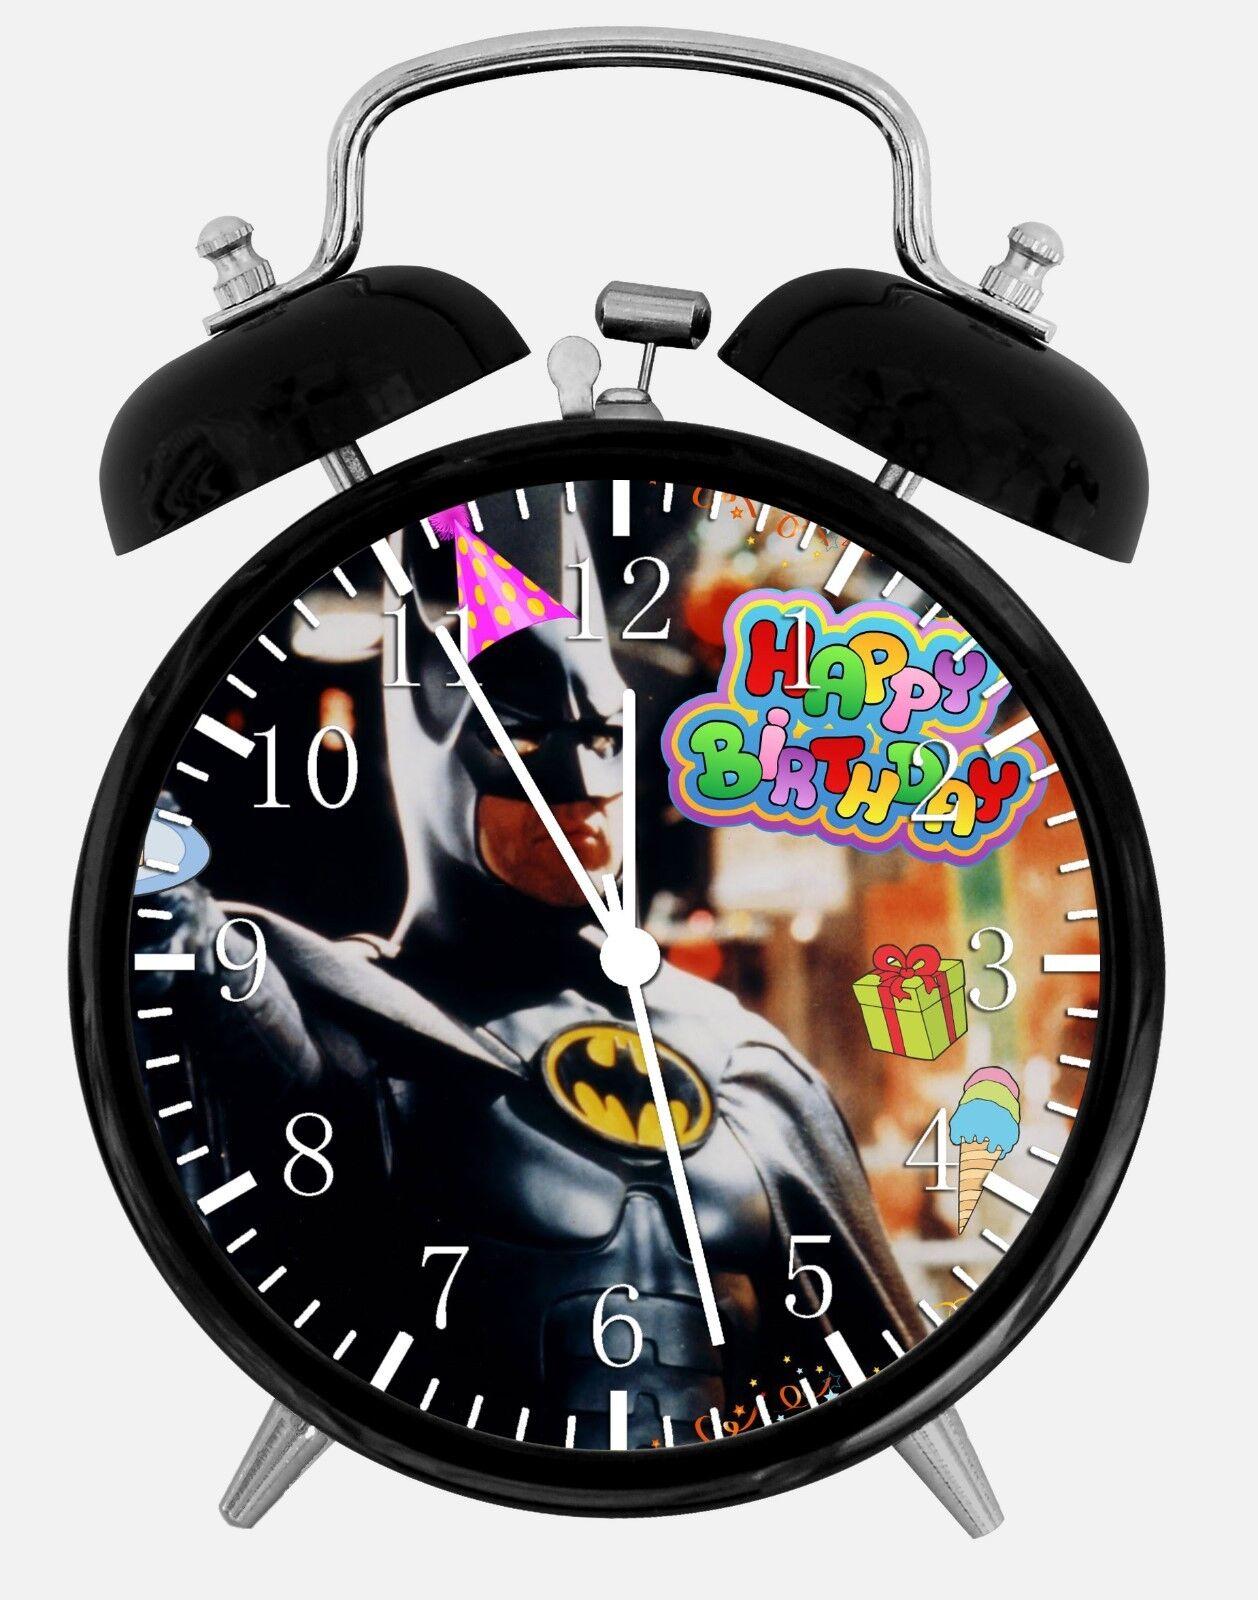 "Batman Birthday Gift Alarm Desk Clock 3.75"" Home or Office Decor E293 Nice Gift"